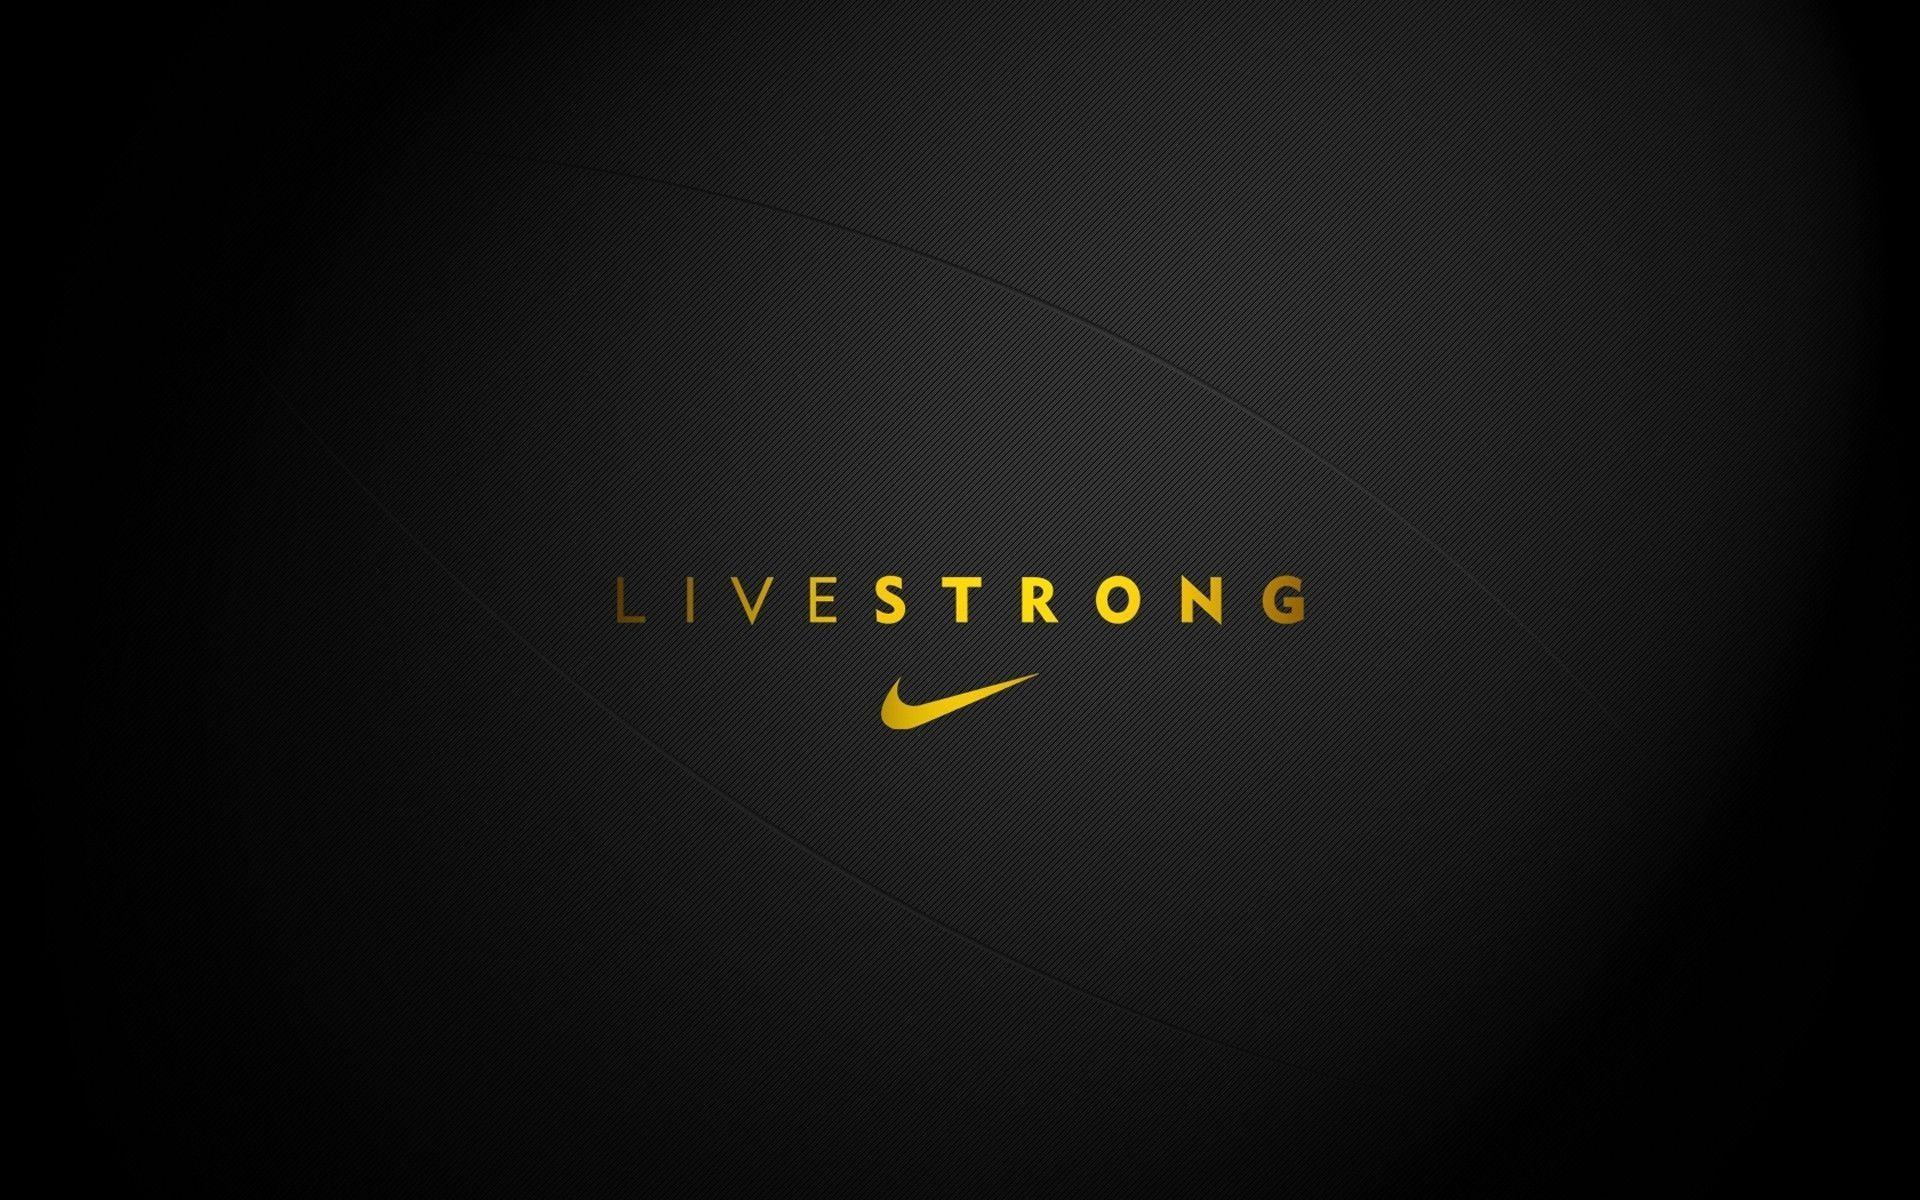 Nike Wallpaper 5 Backgrounds | Wallruru.